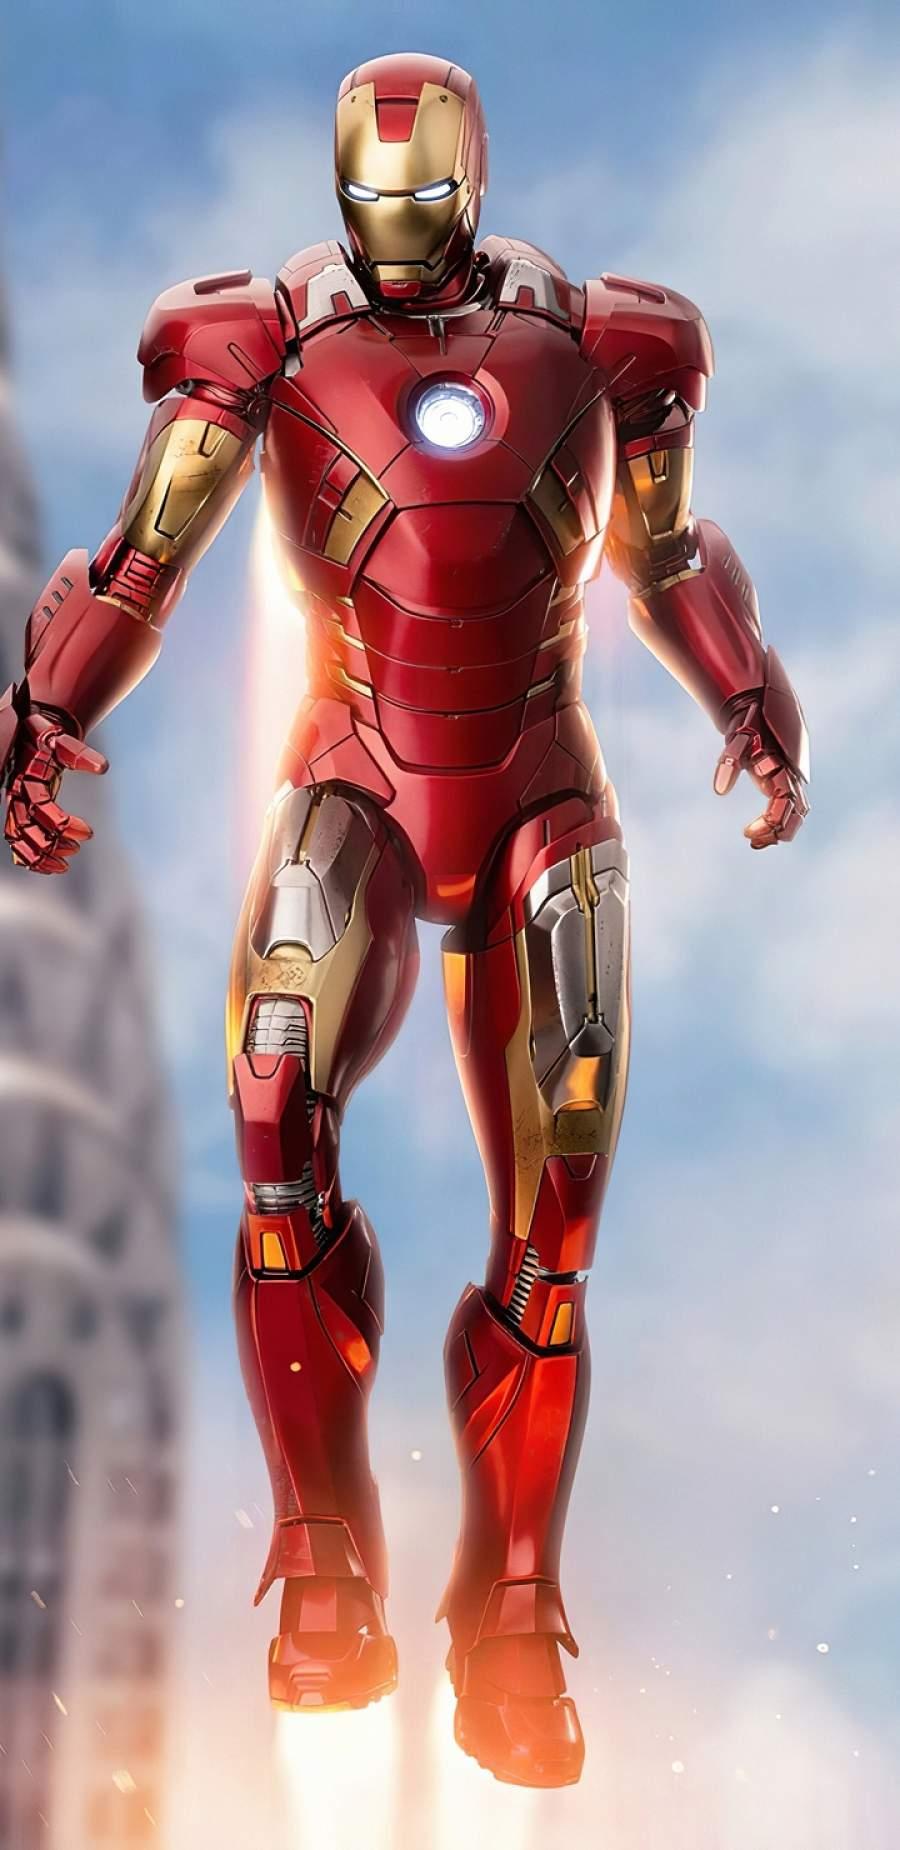 Iron Man New iPhone Wallpaper